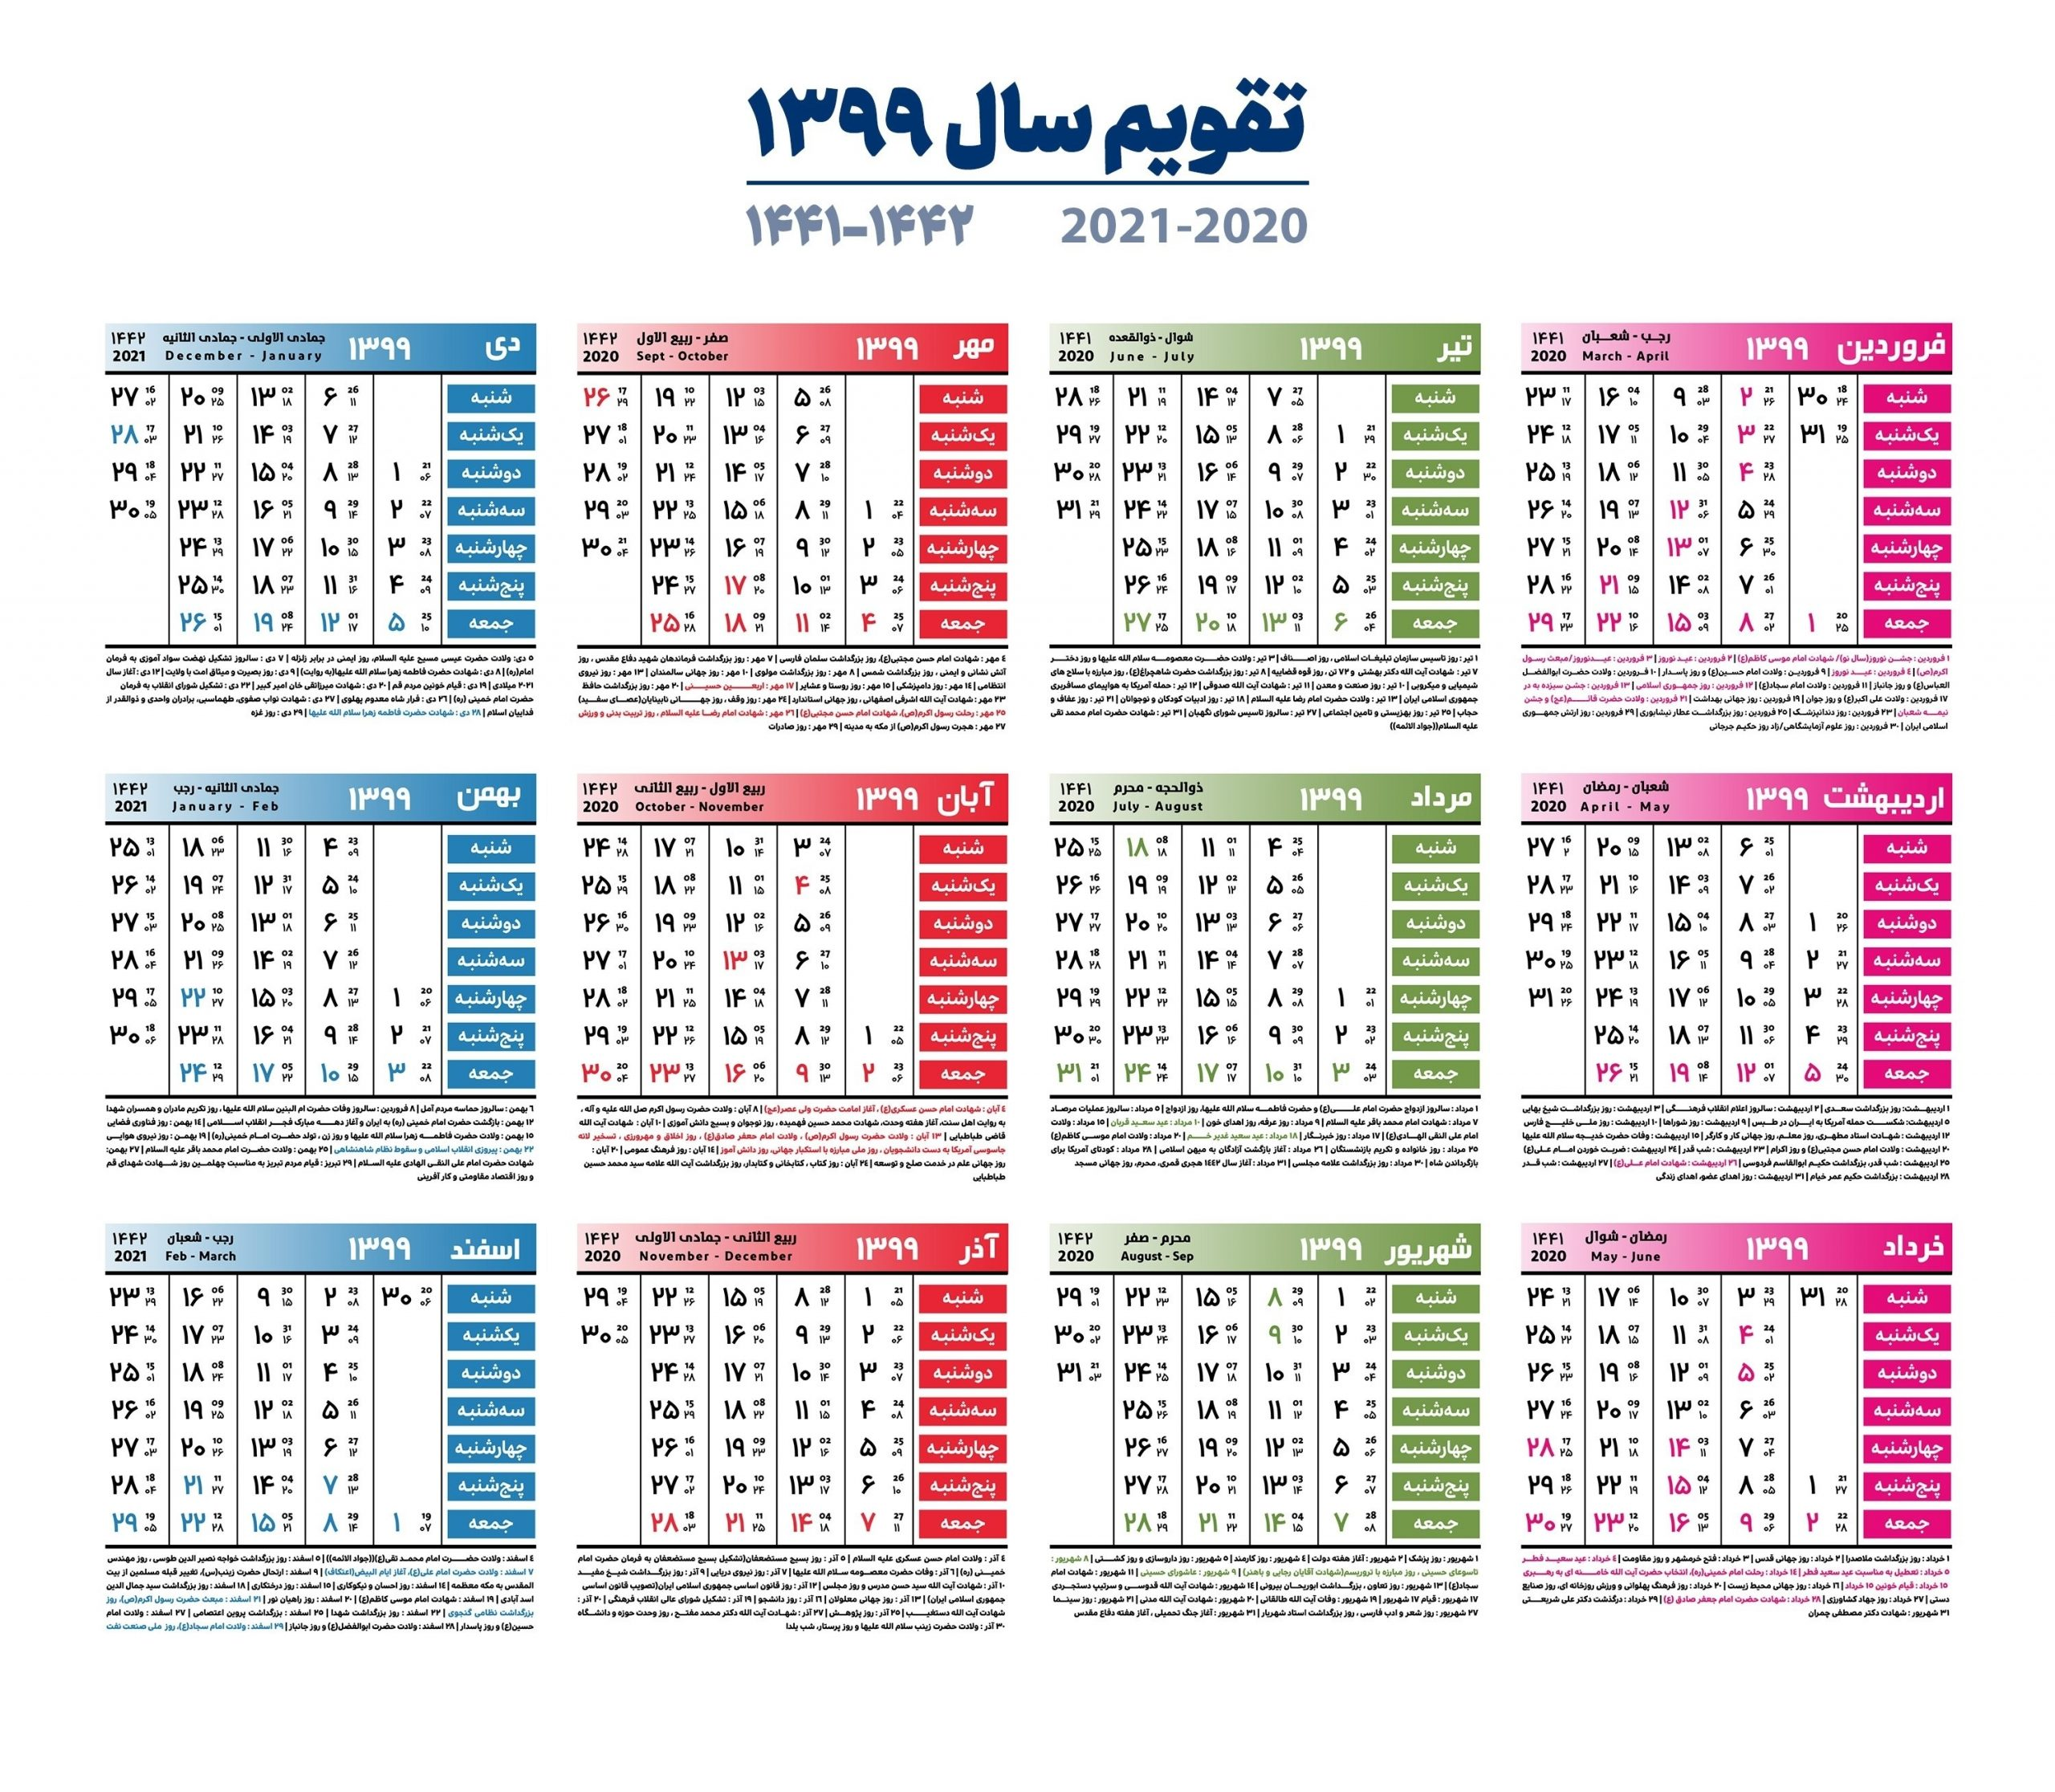 Julian Vs Gregorian Calendar 2021 | Printable Calendar